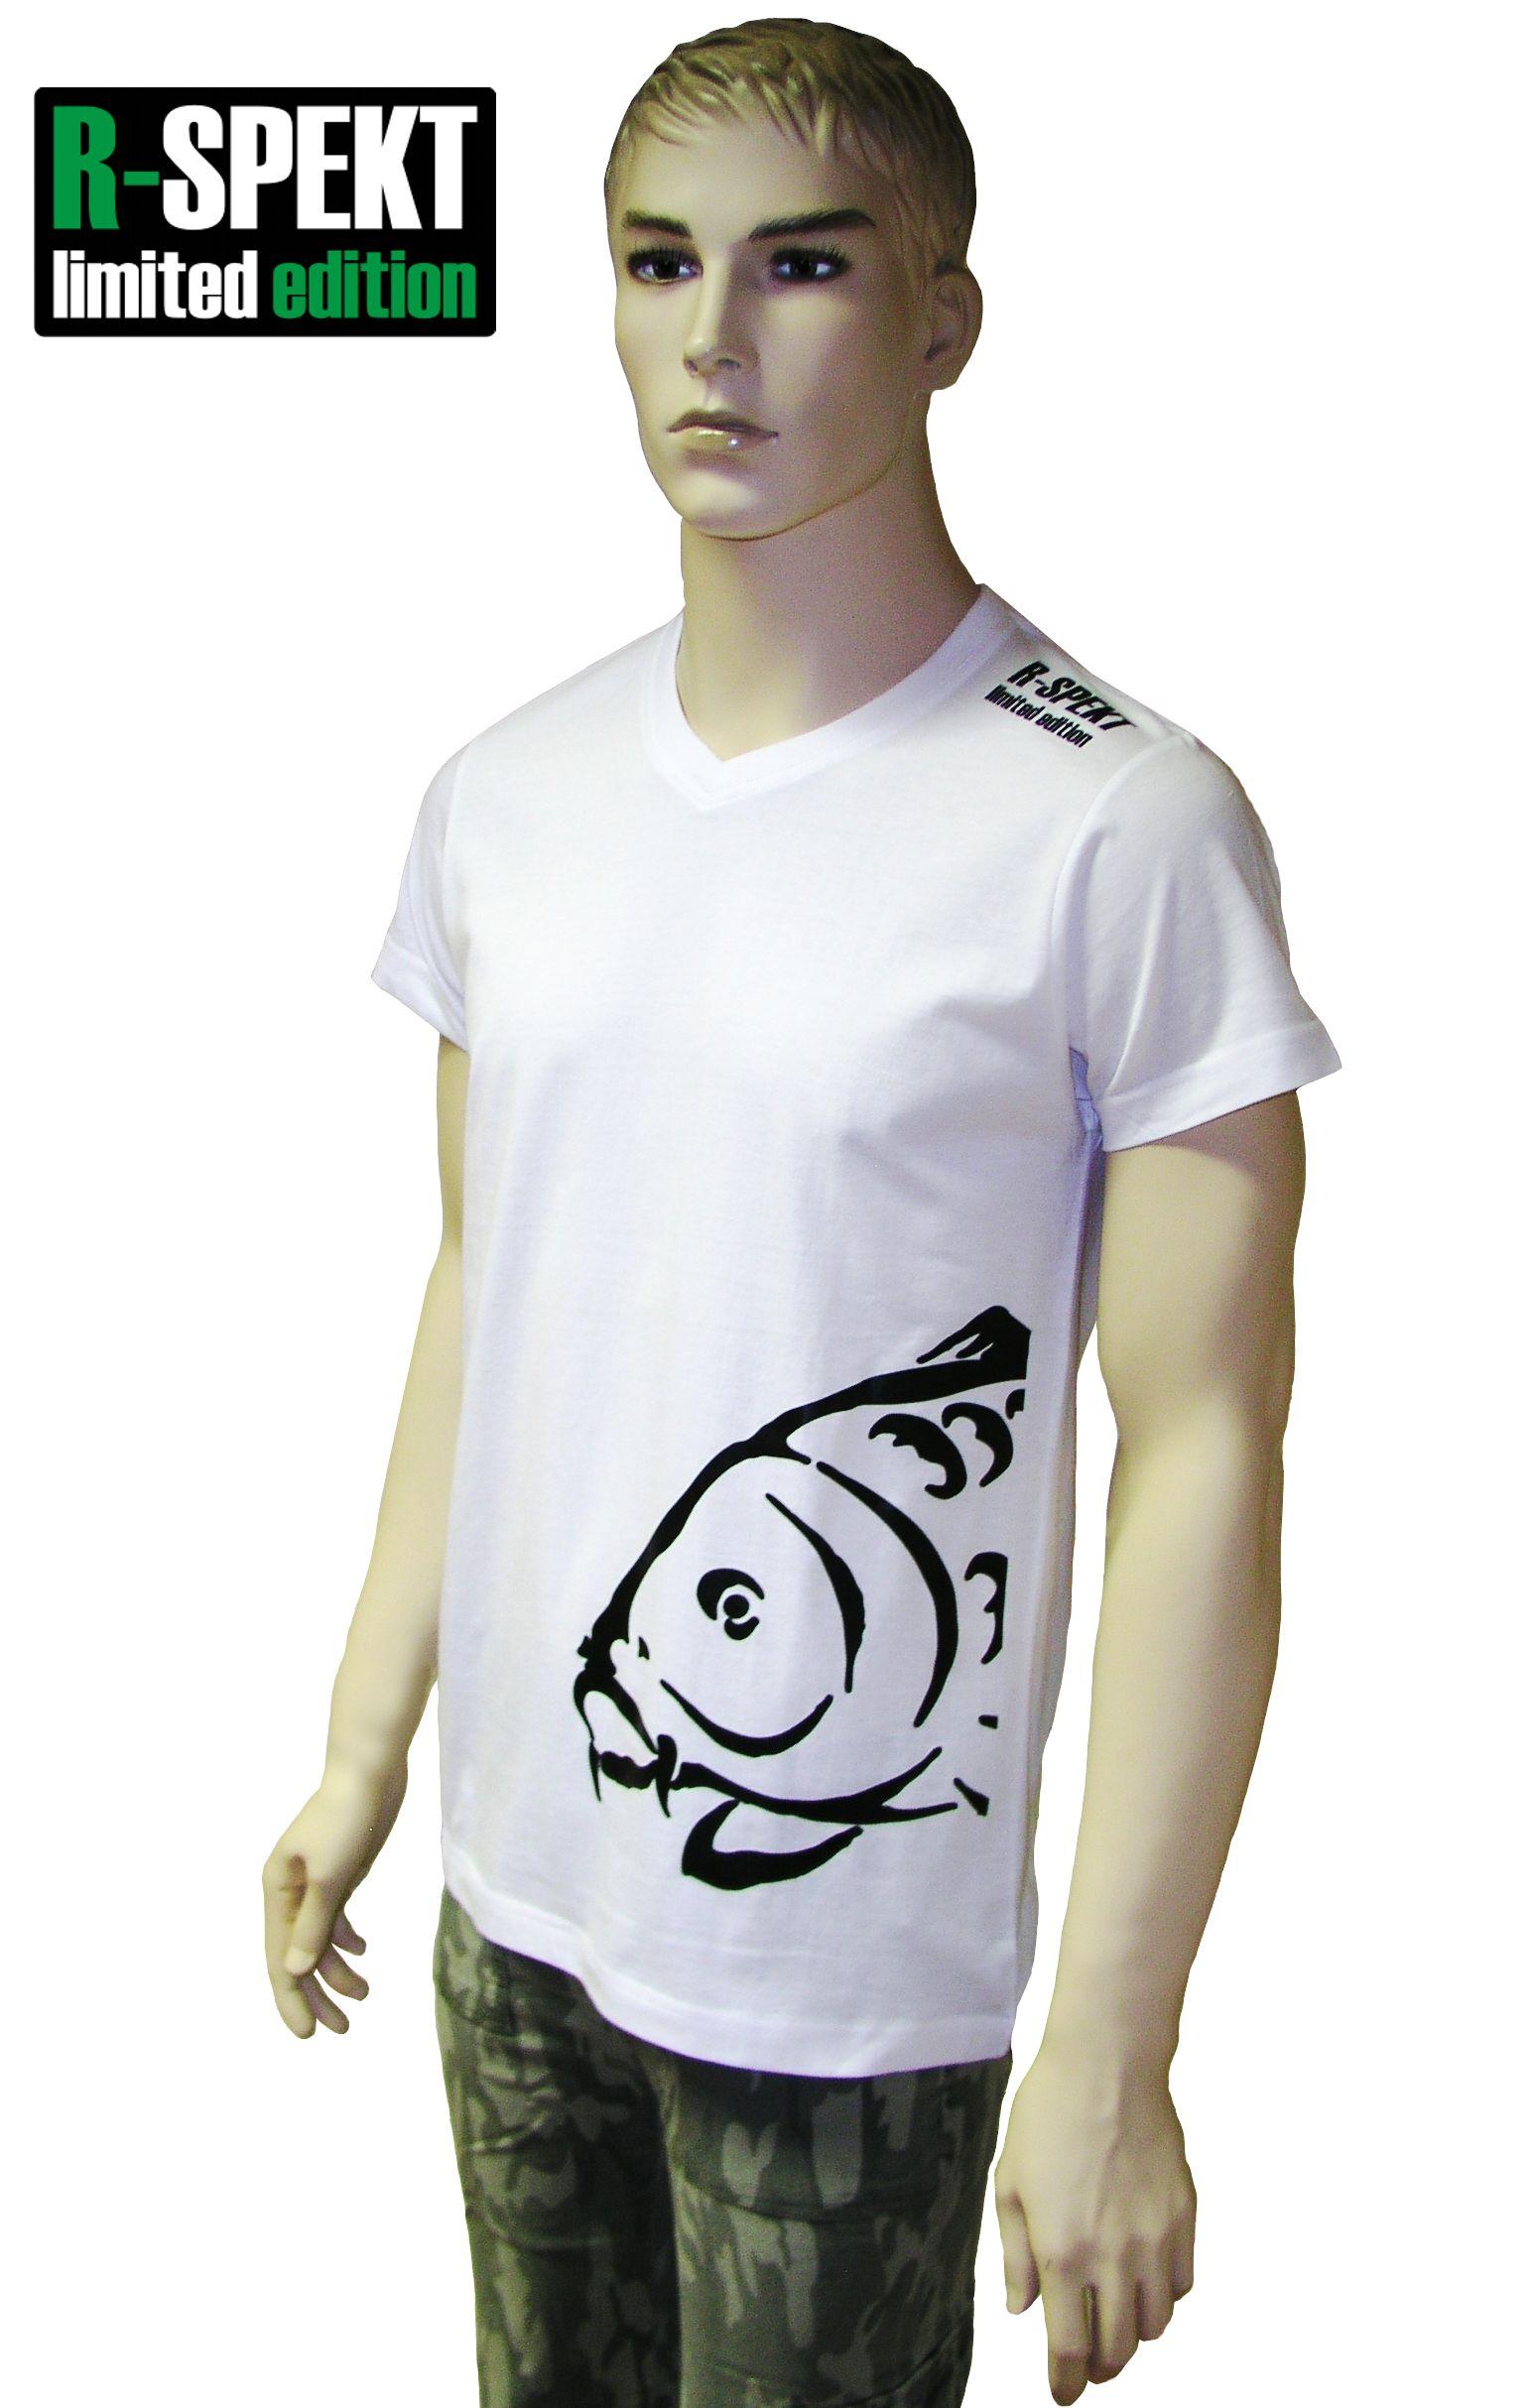 Tričko R-SPEKT Carper bílé